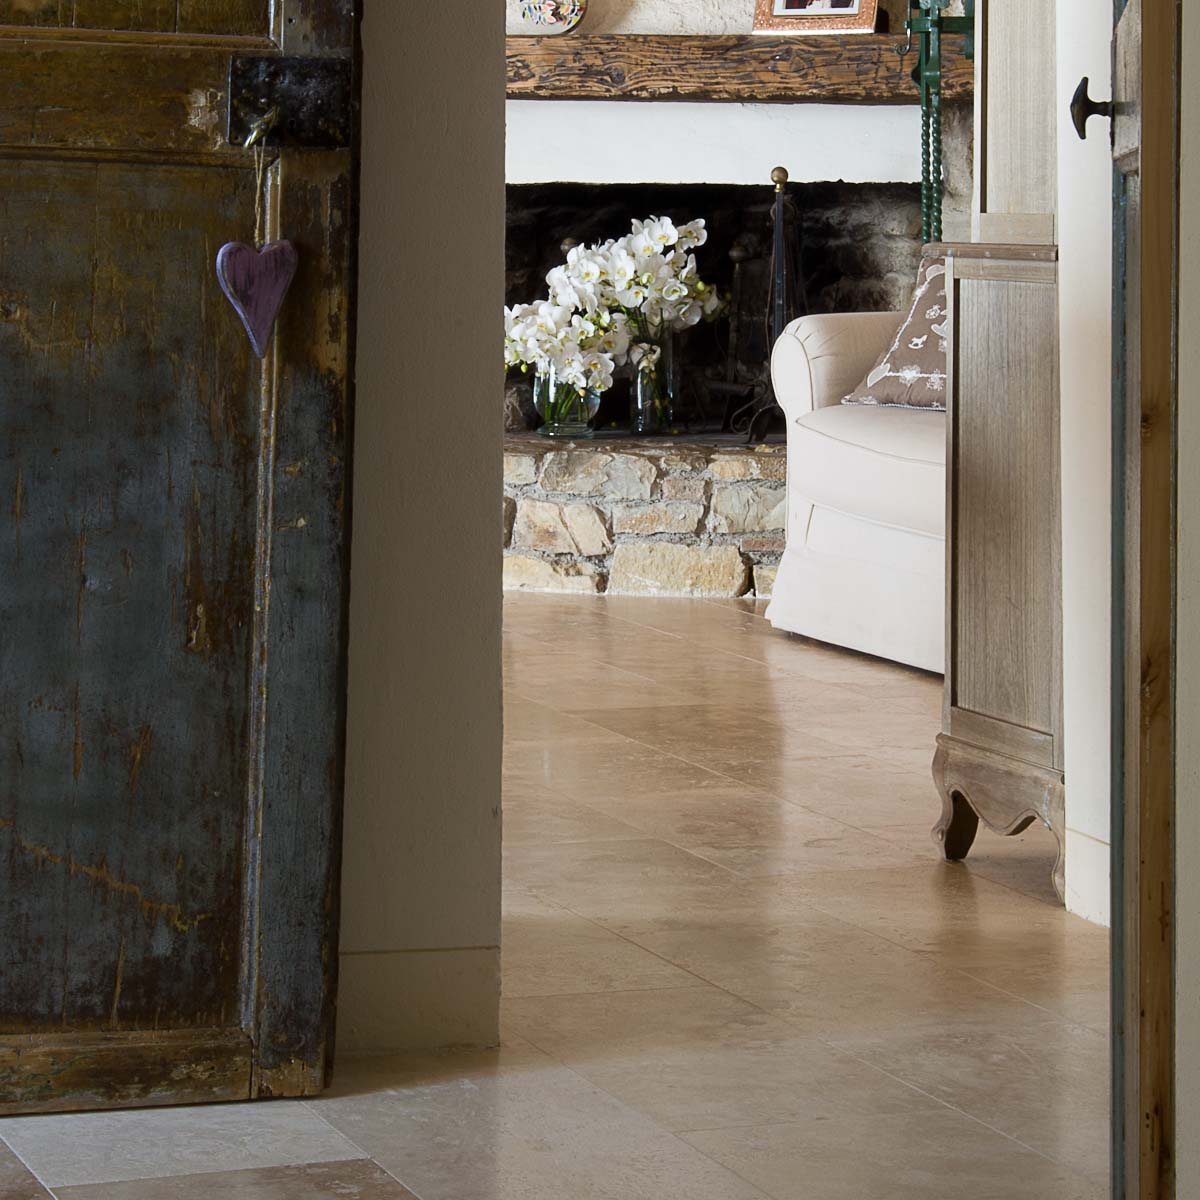 Casa colonica nella campagna toscana a impruneta for Tipi di case in italia